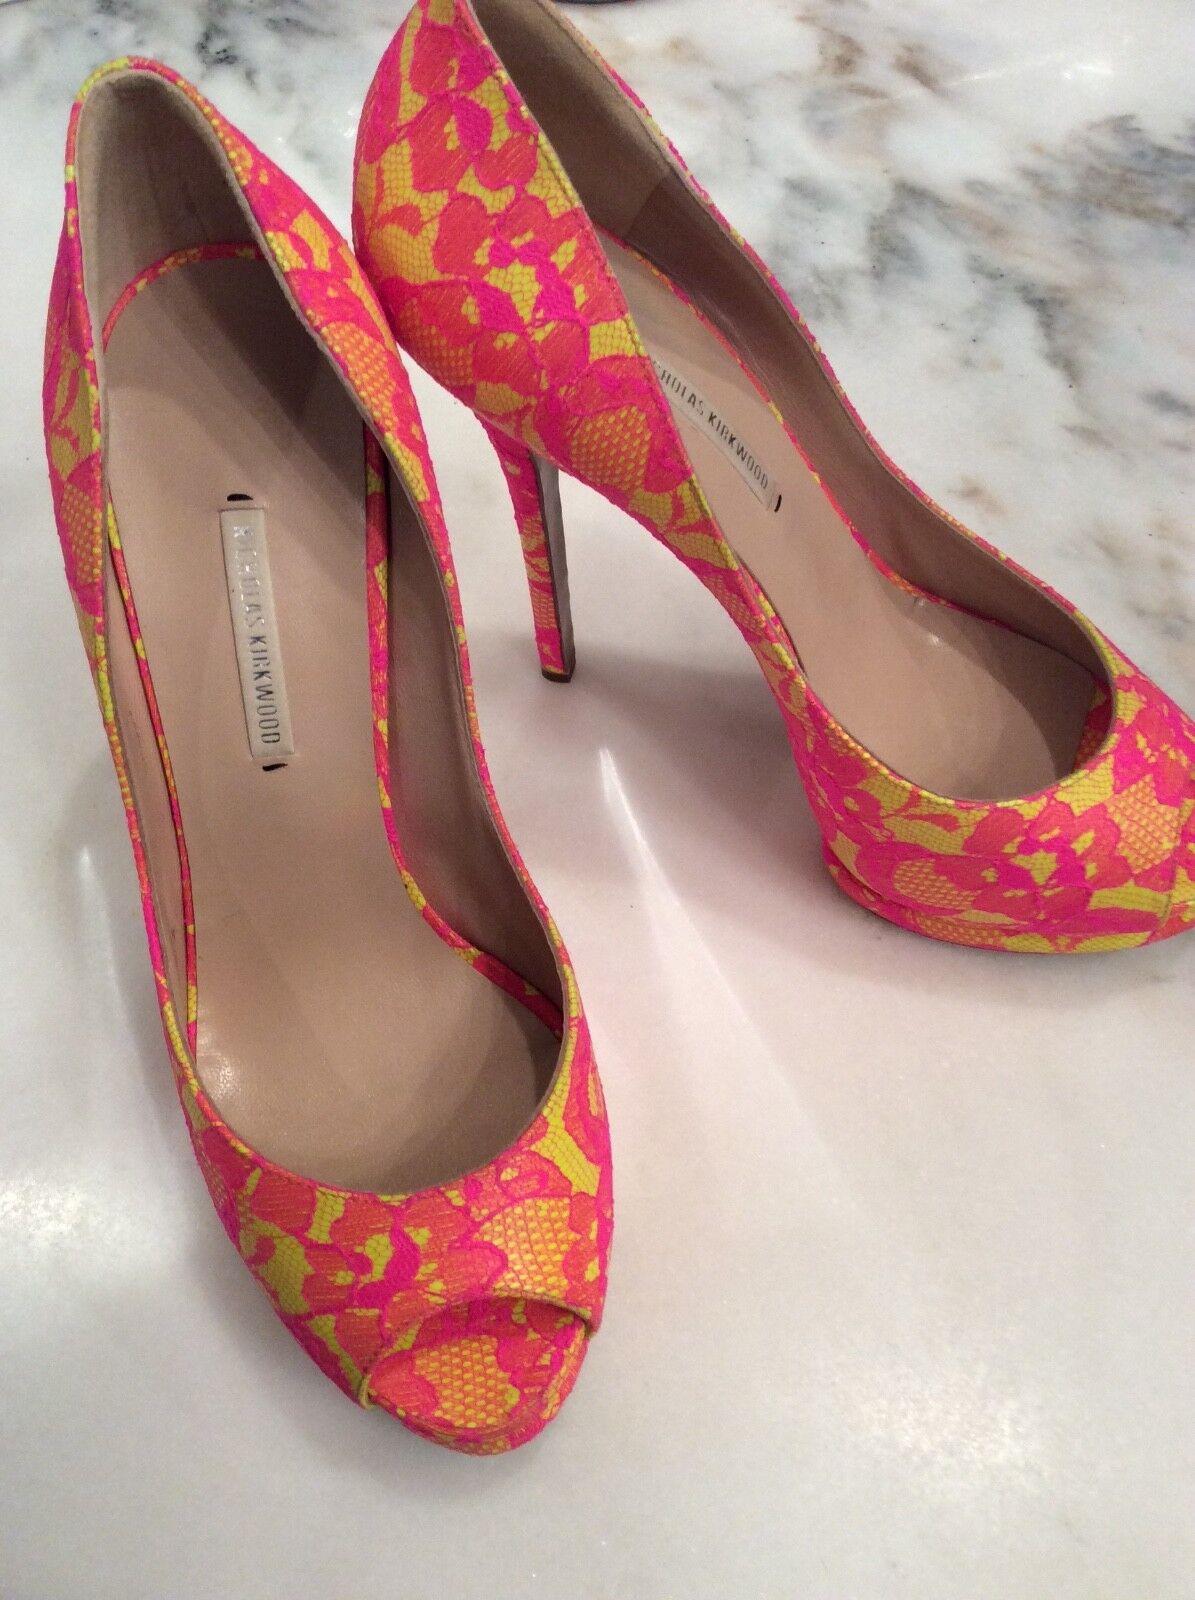 Gorgeous Nicholas Kirkwood Neon Pink & Yellow Lace Print Open Toe Heel Sz 39 1 2